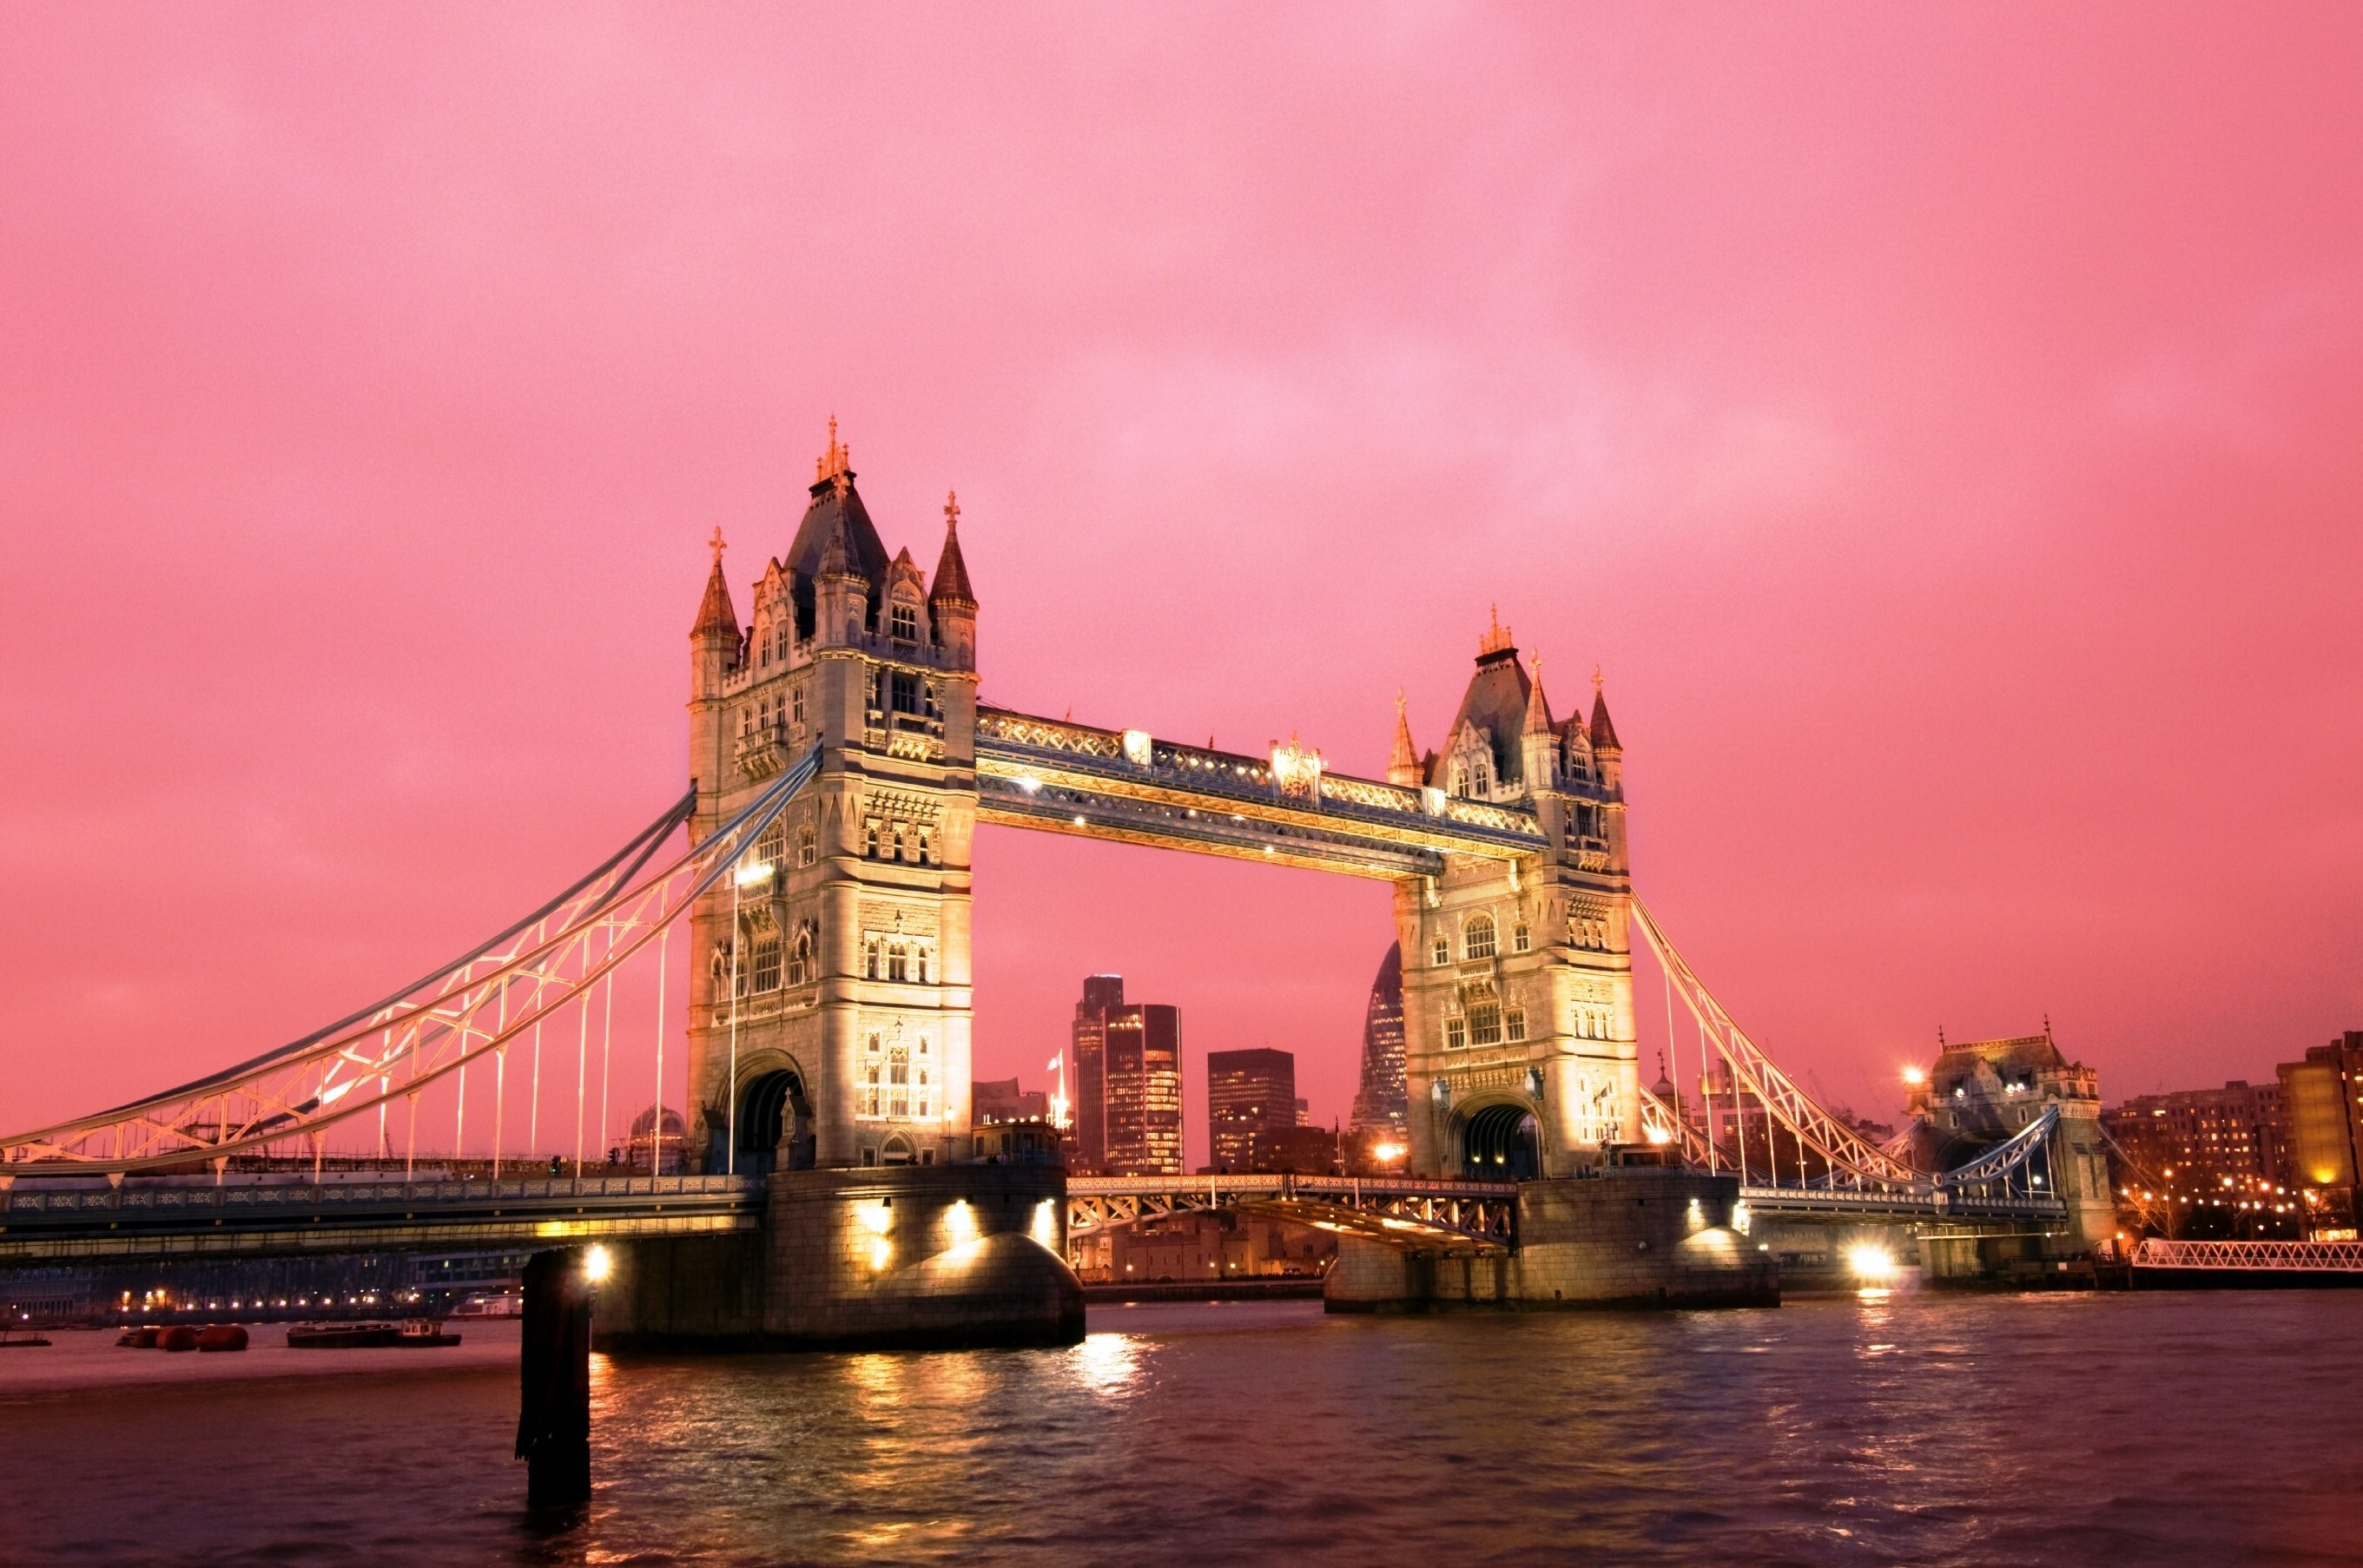 Elegant Night View Of Tower Bridge In UK HD Wallpapers